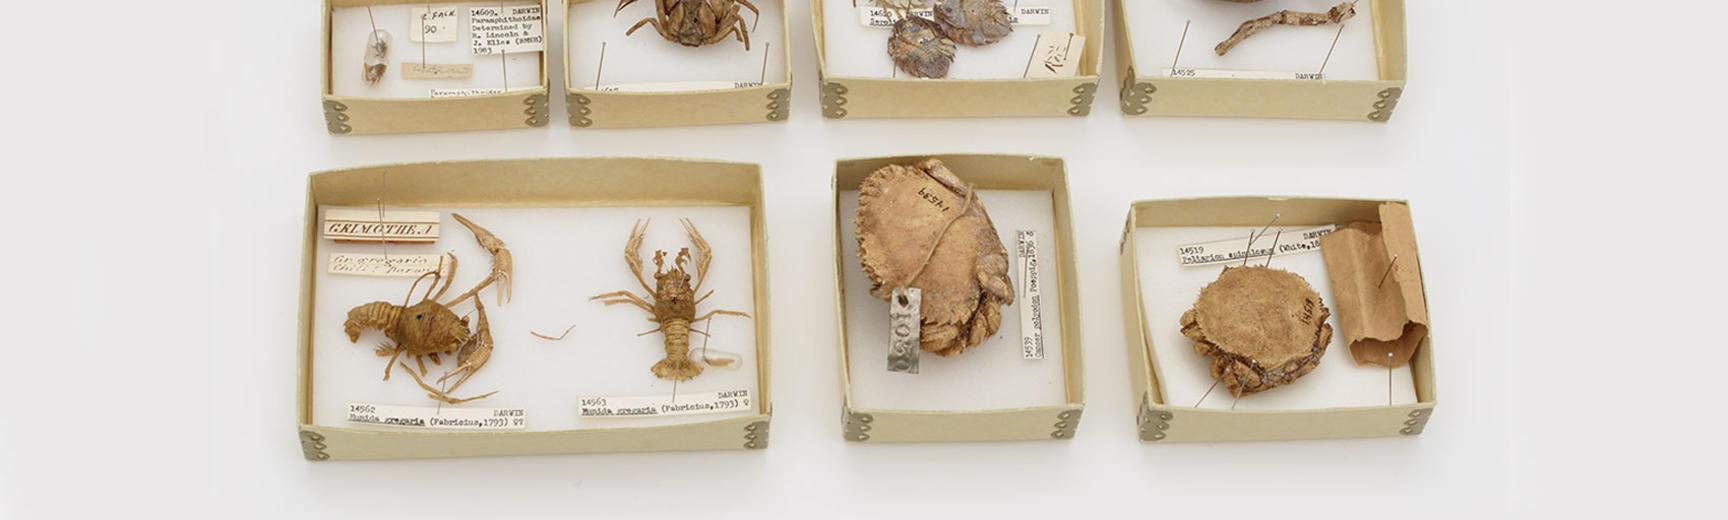 darwins crabs main banner